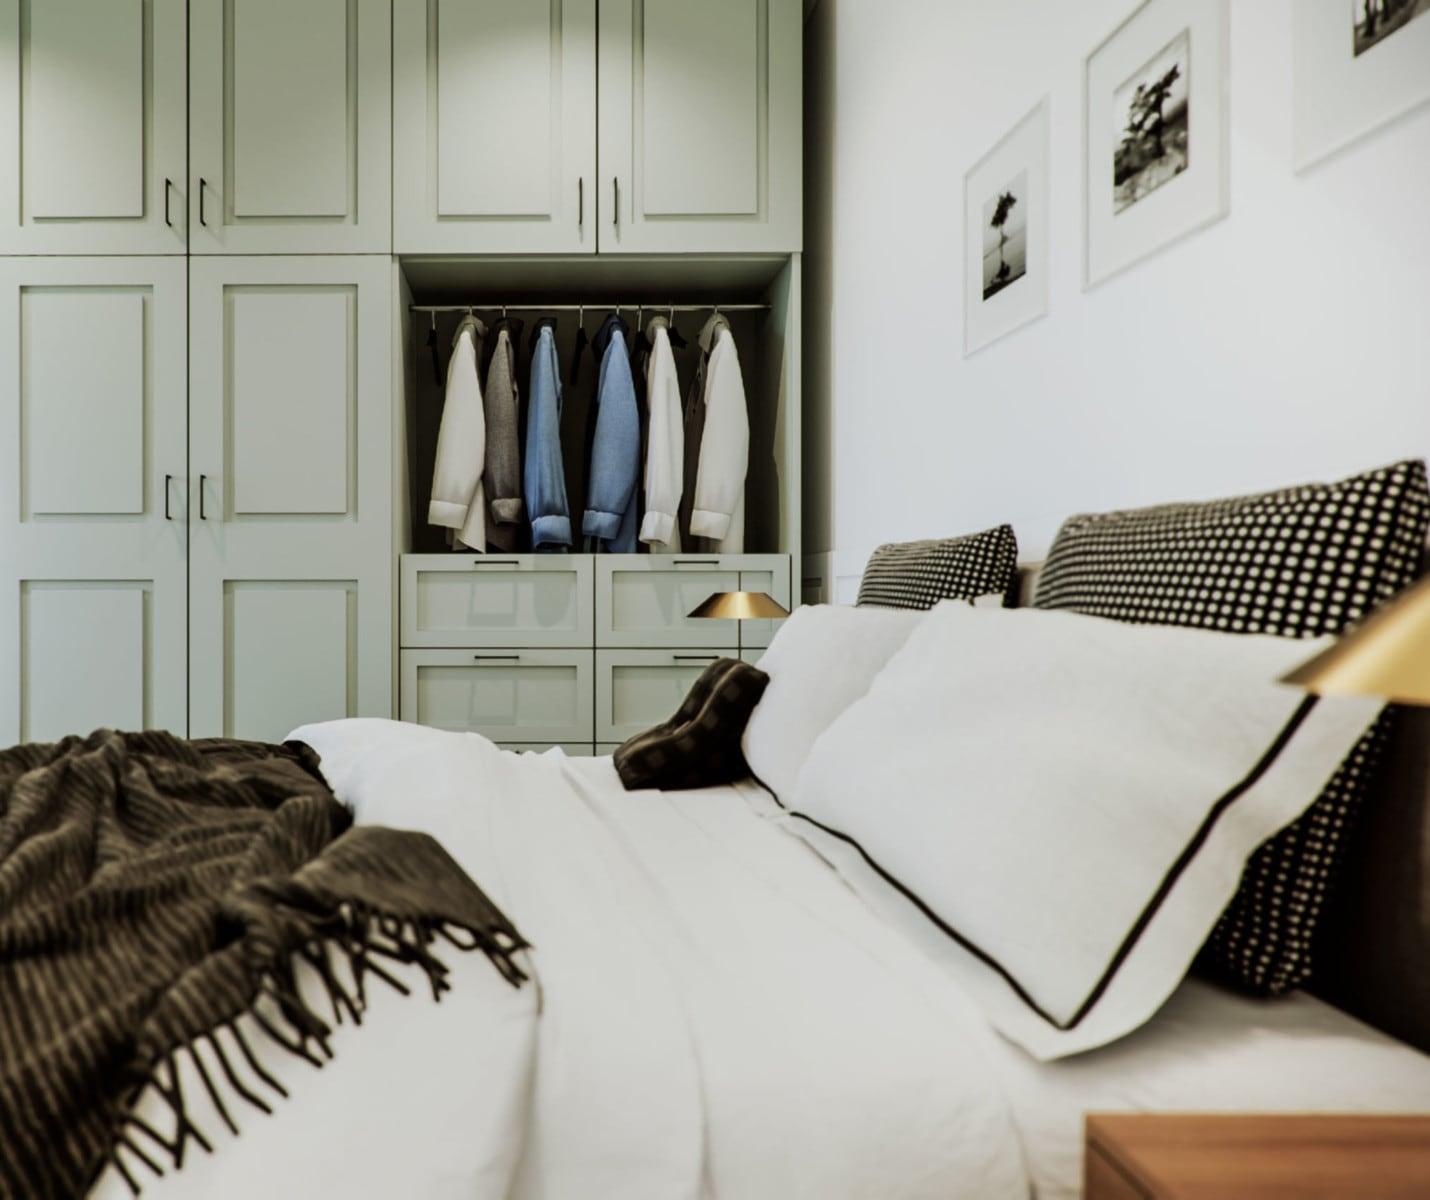 318032_Render_Tuggeranong_Bedroom